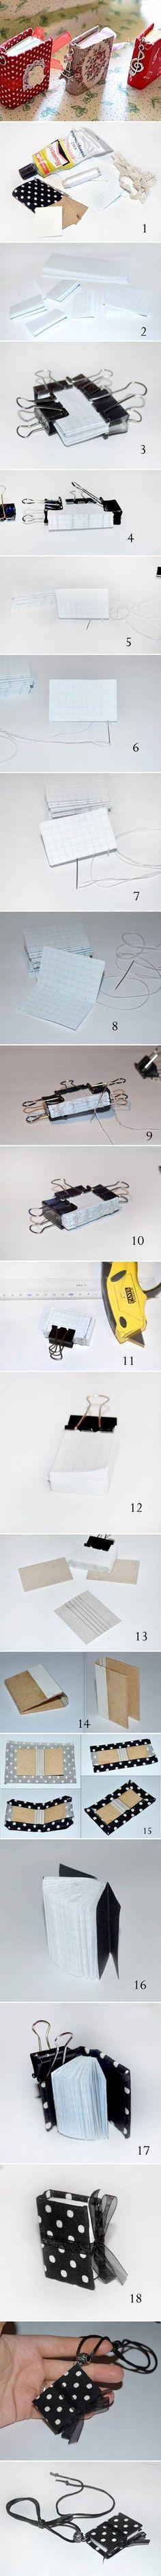 DIY Mini Notebook Pendant DIY Projects